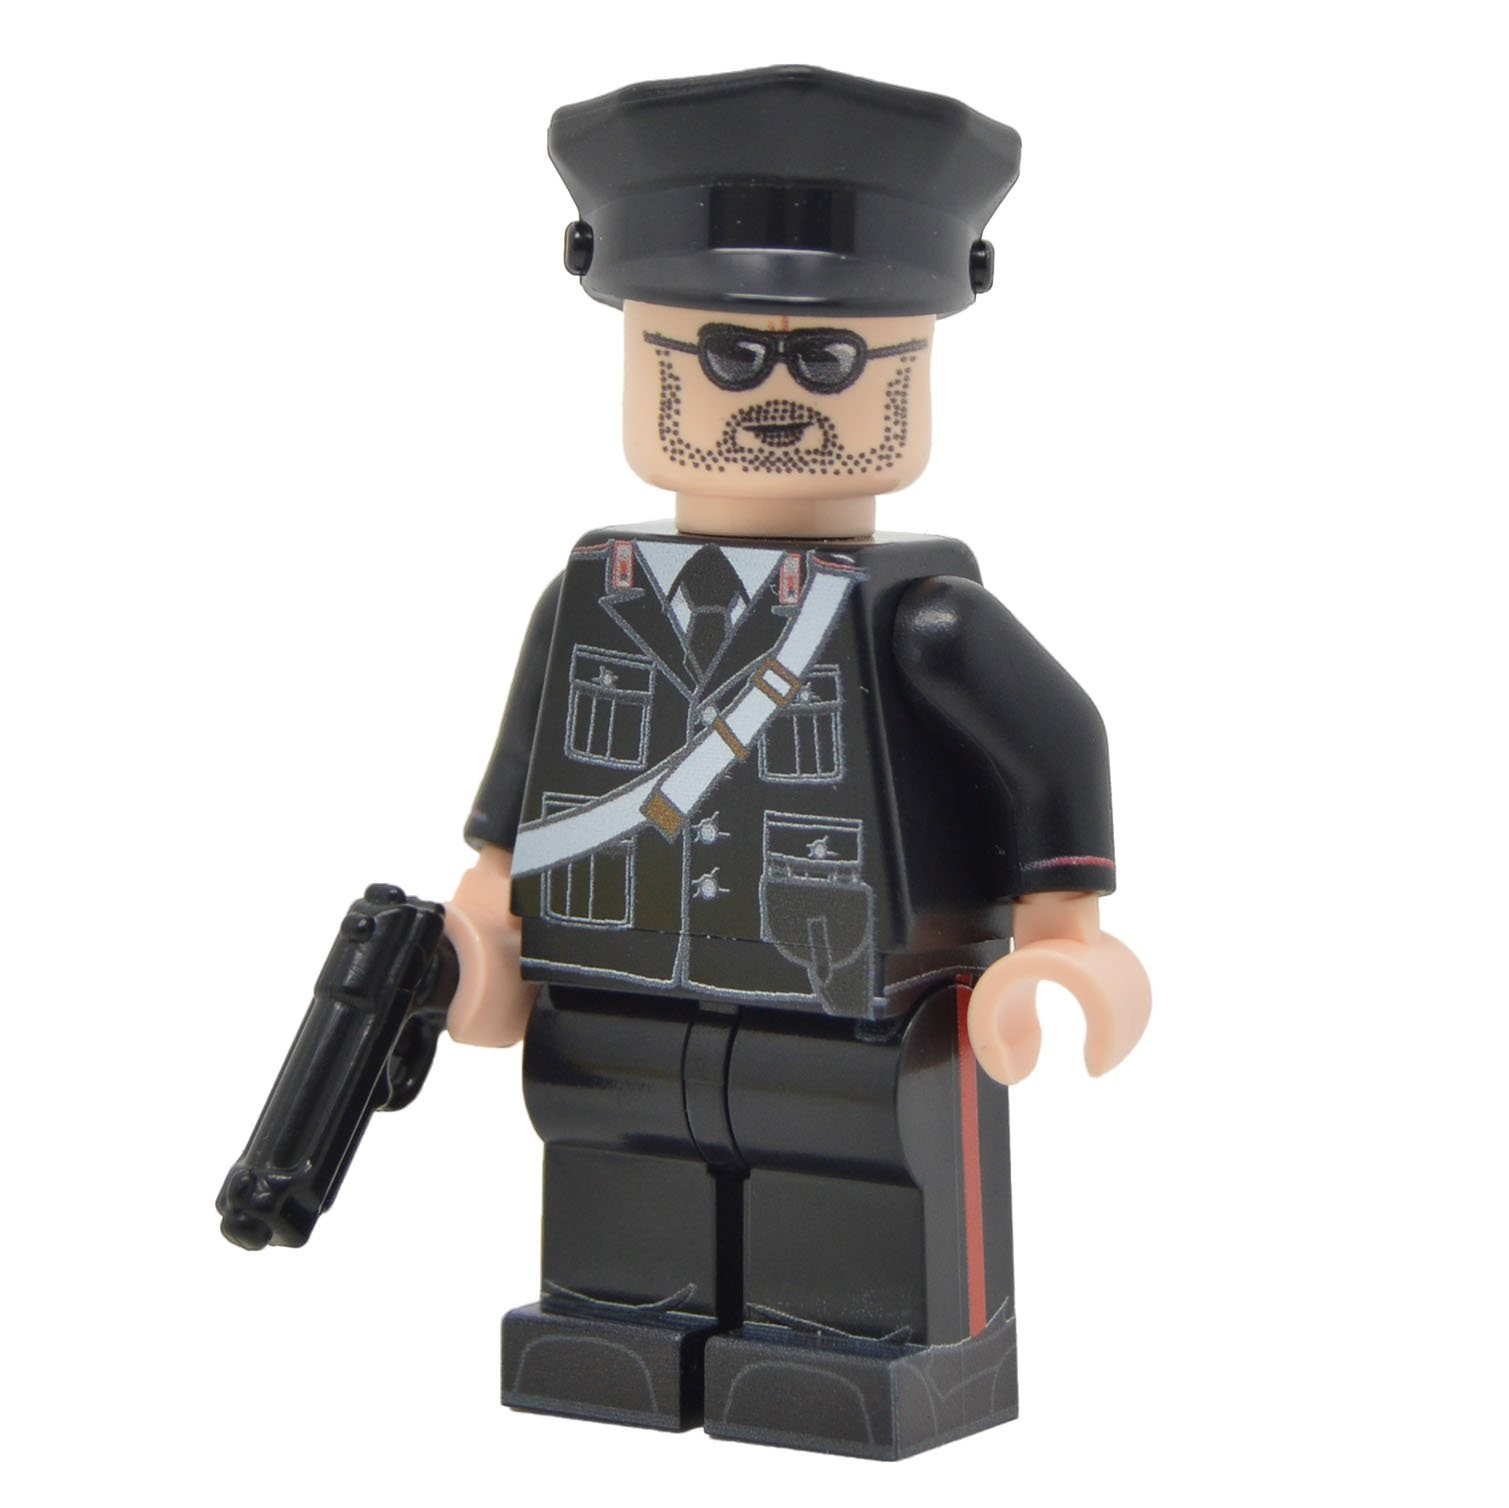 Lego 100 New White Minifigure Visor Snow Goggles Pieces